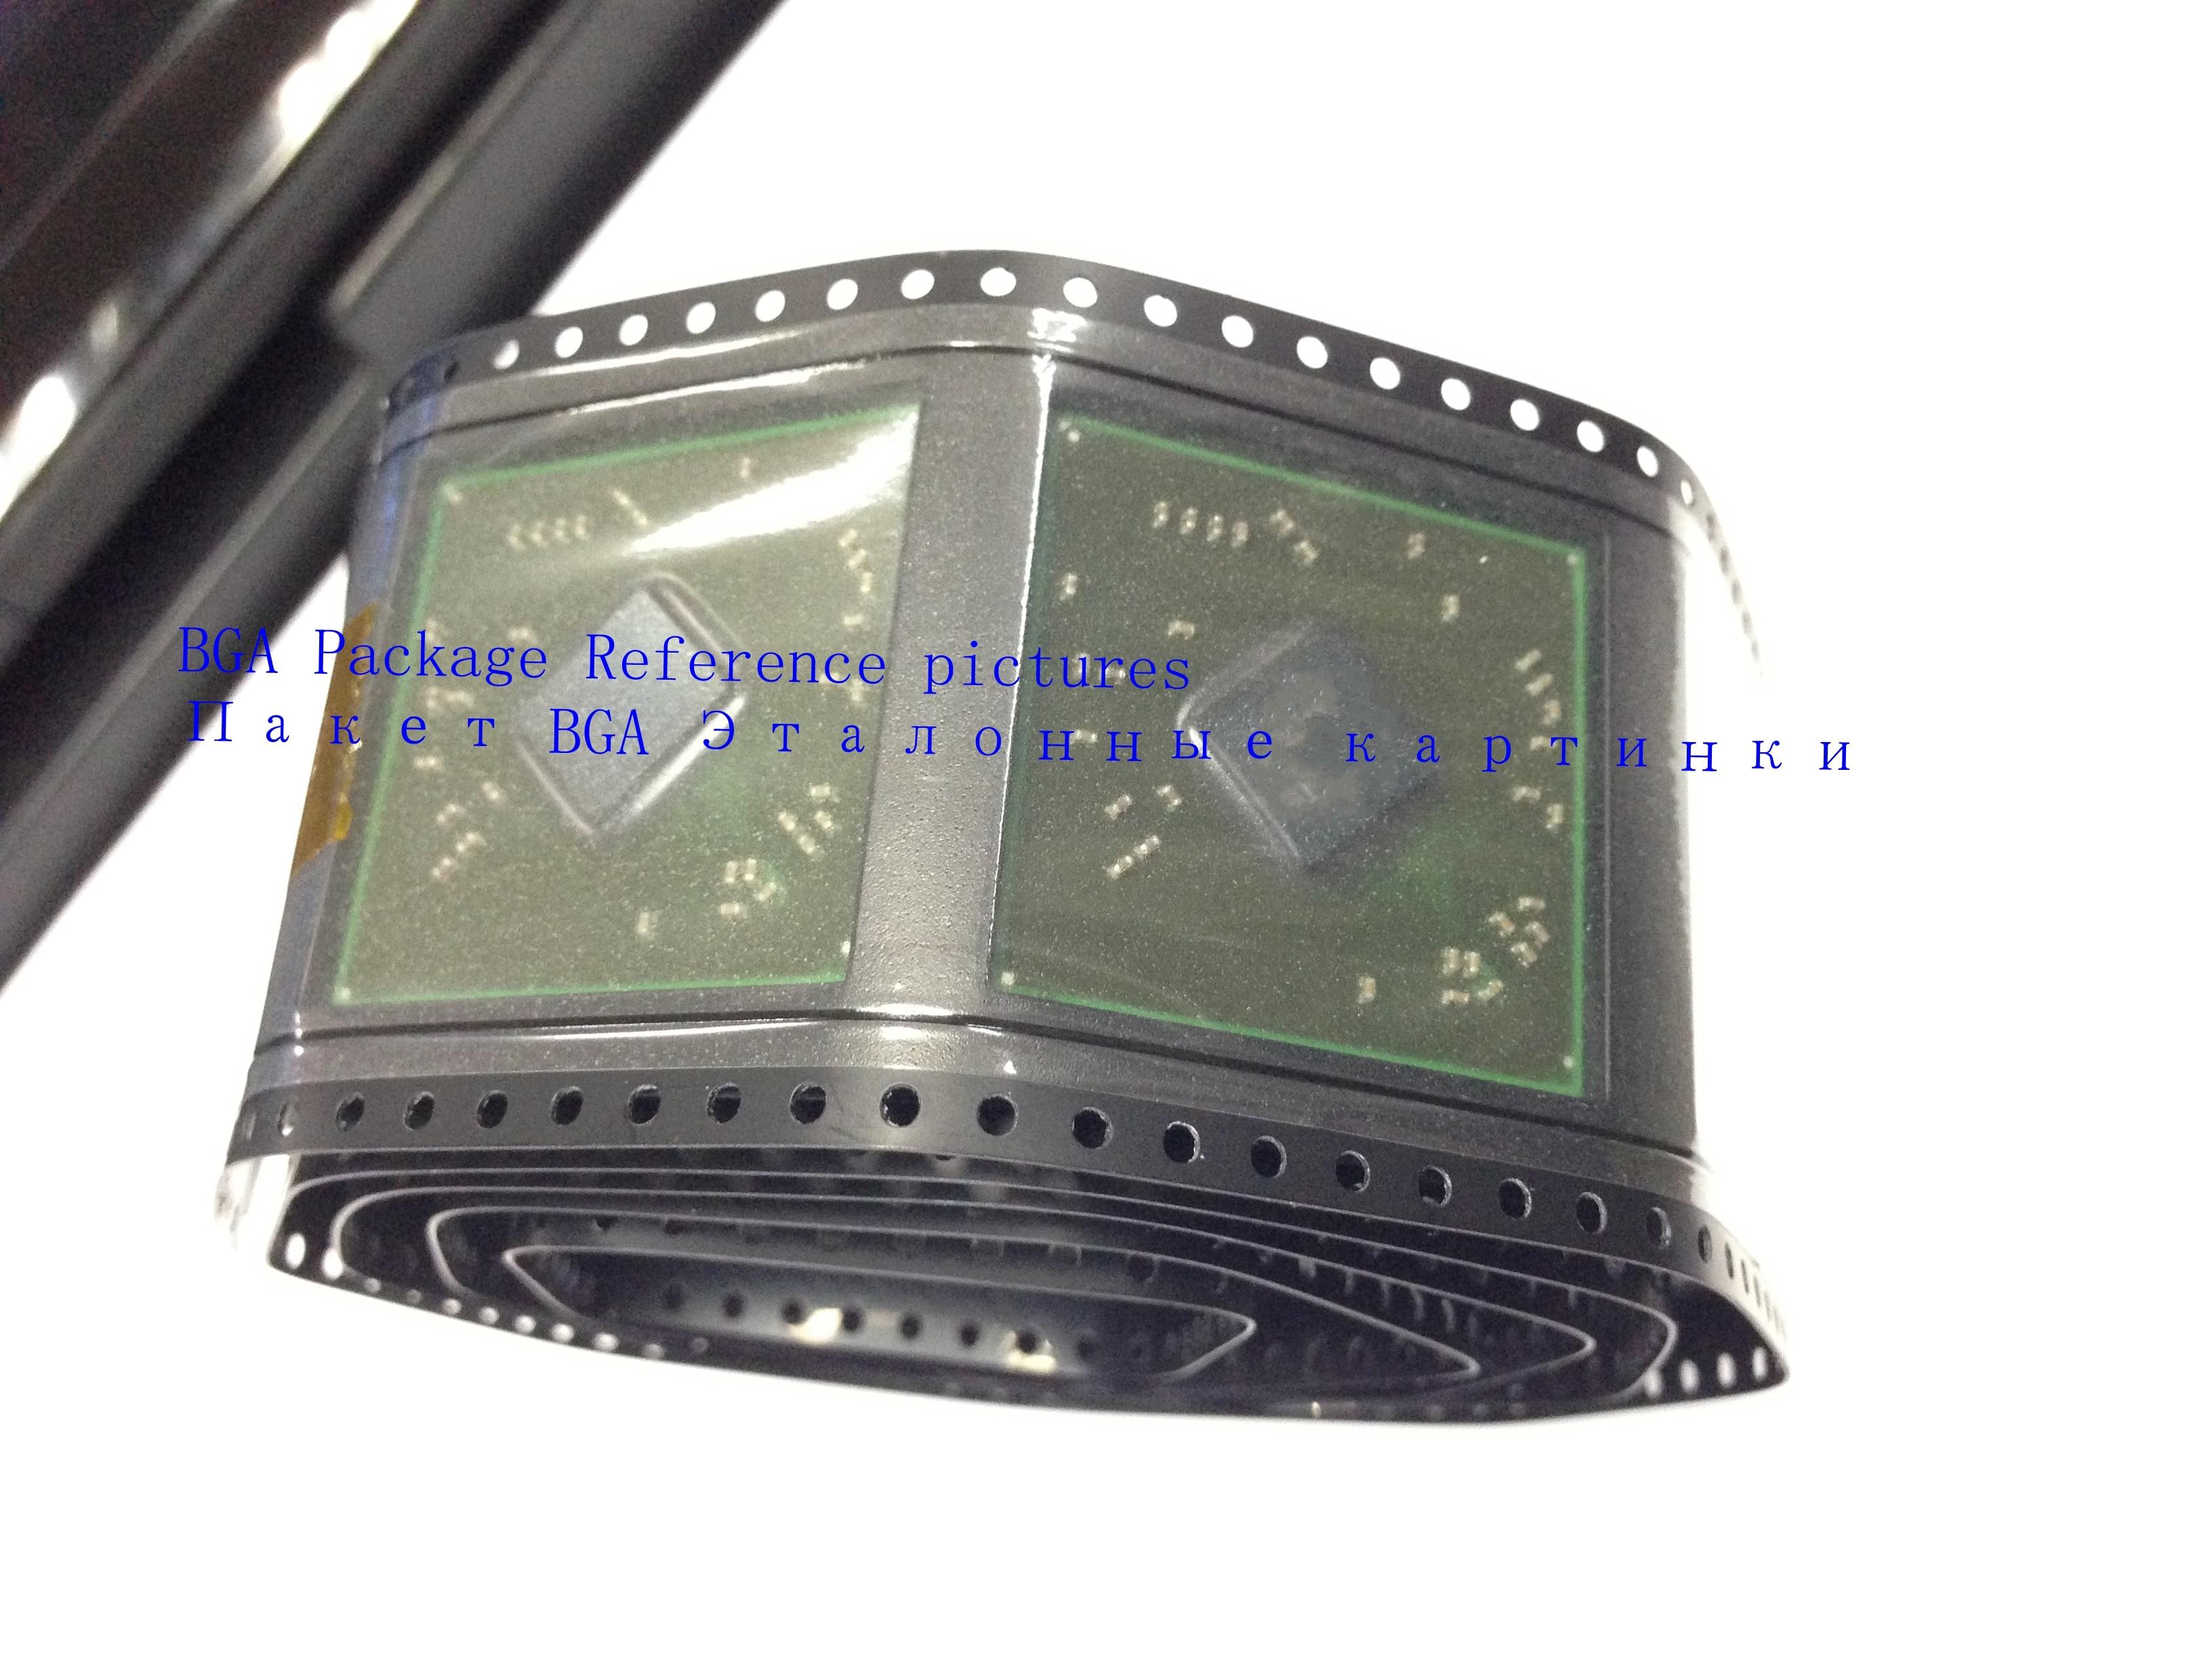 1pcs/lot 100% New SR2KN N3060 BGA Chipset1pcs/lot 100% New SR2KN N3060 BGA Chipset